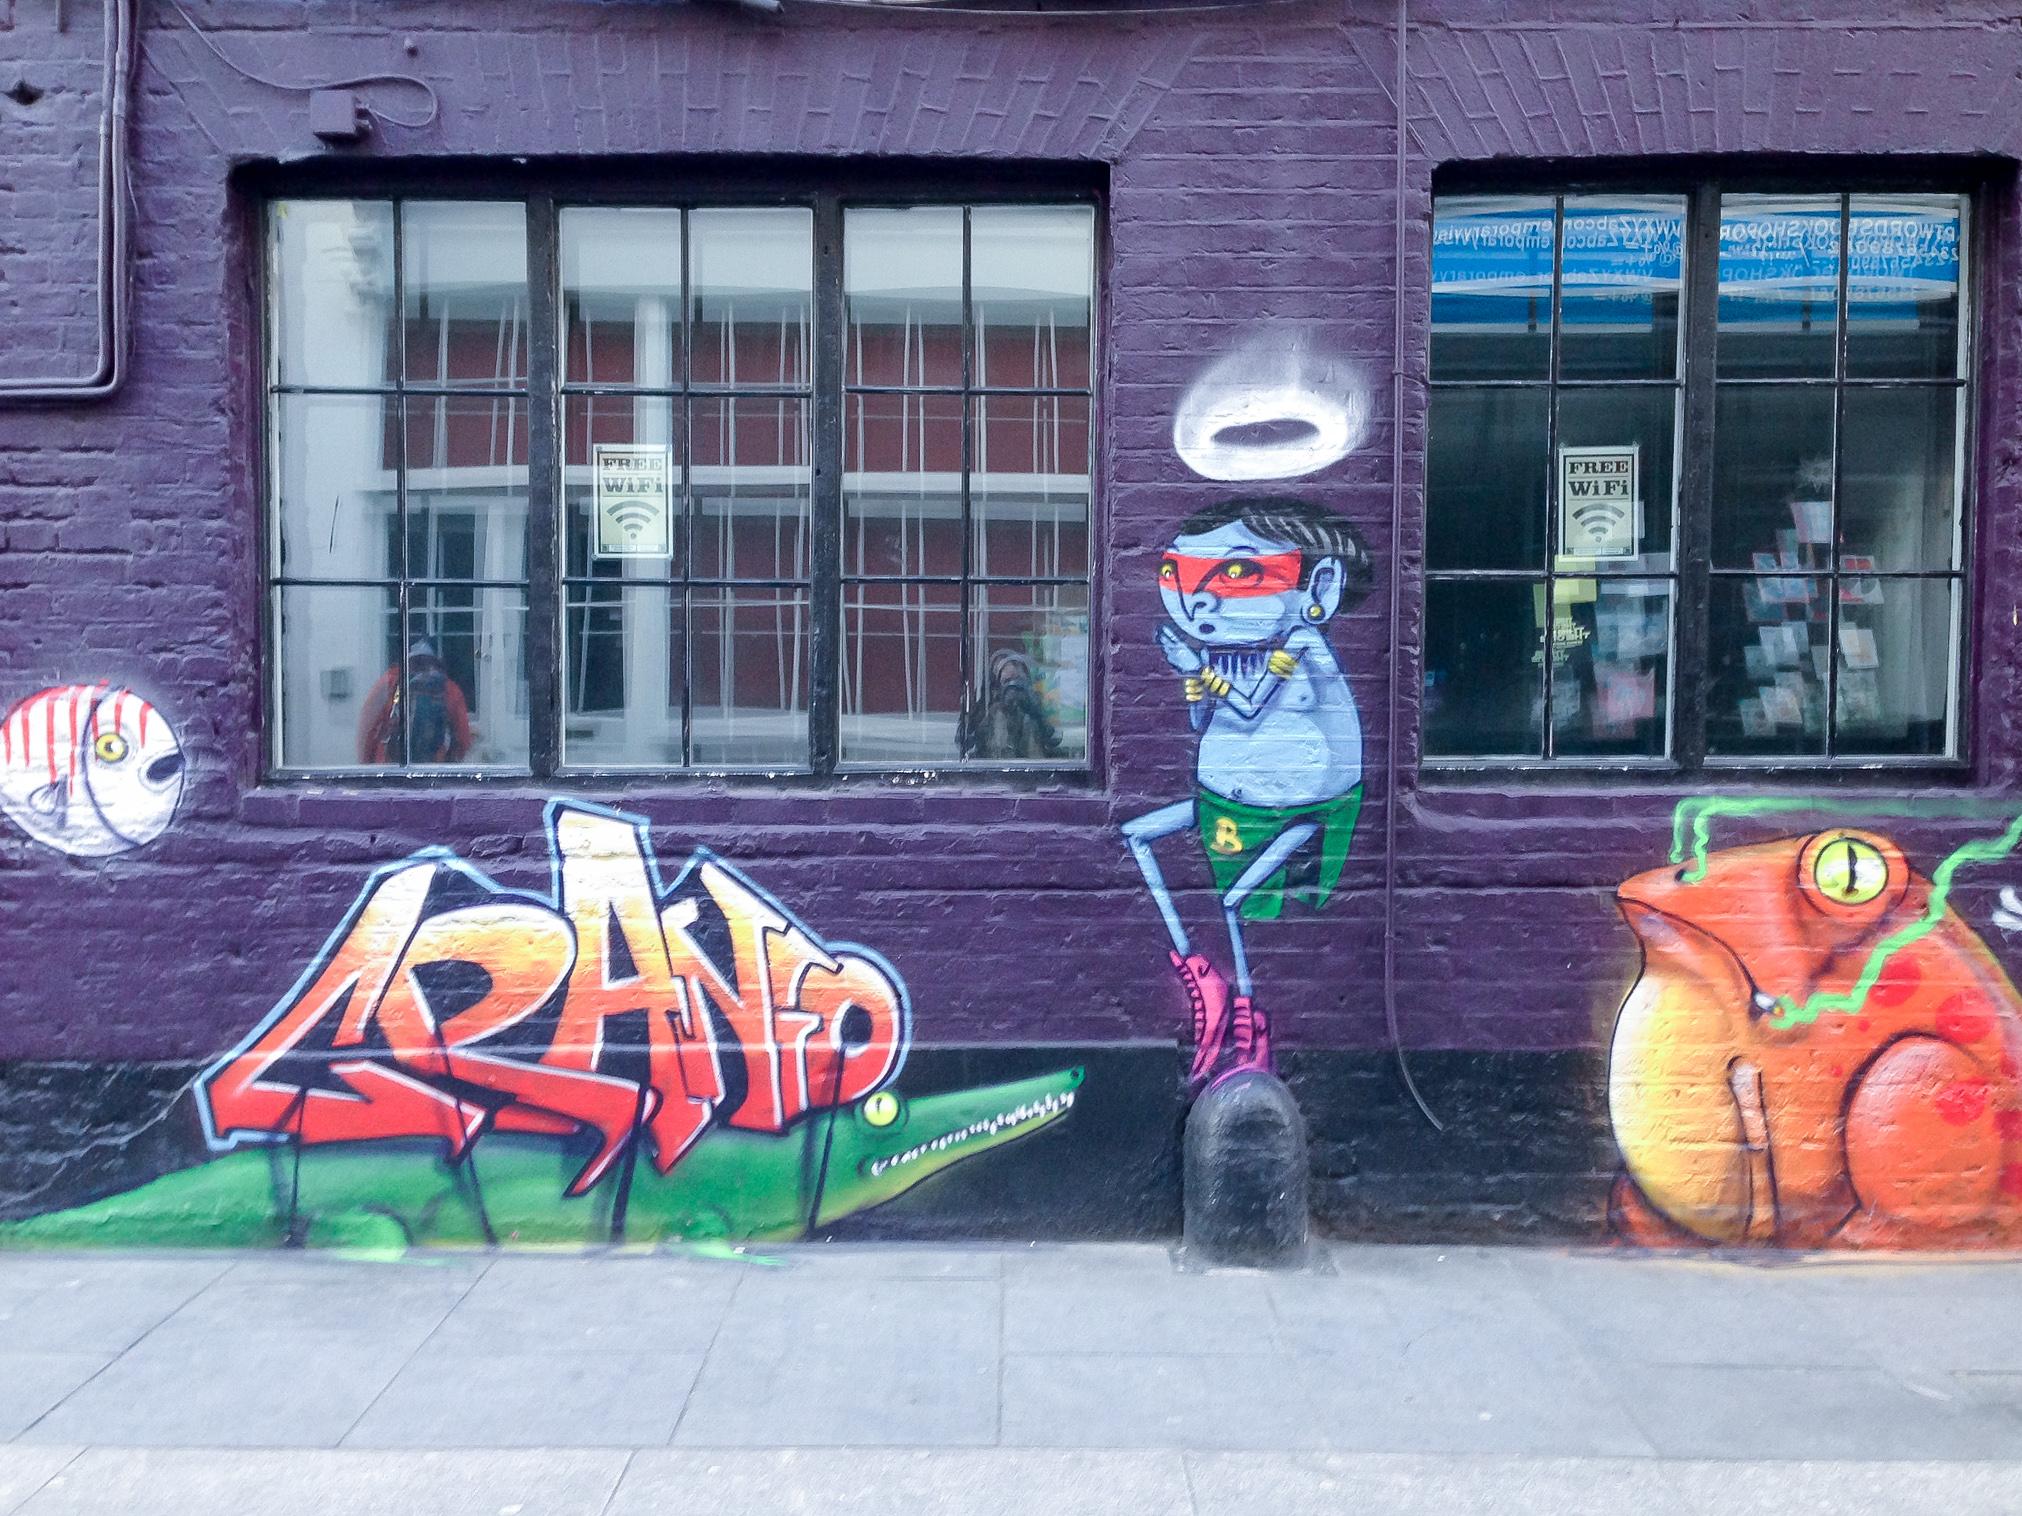 A Cranio mural in London.